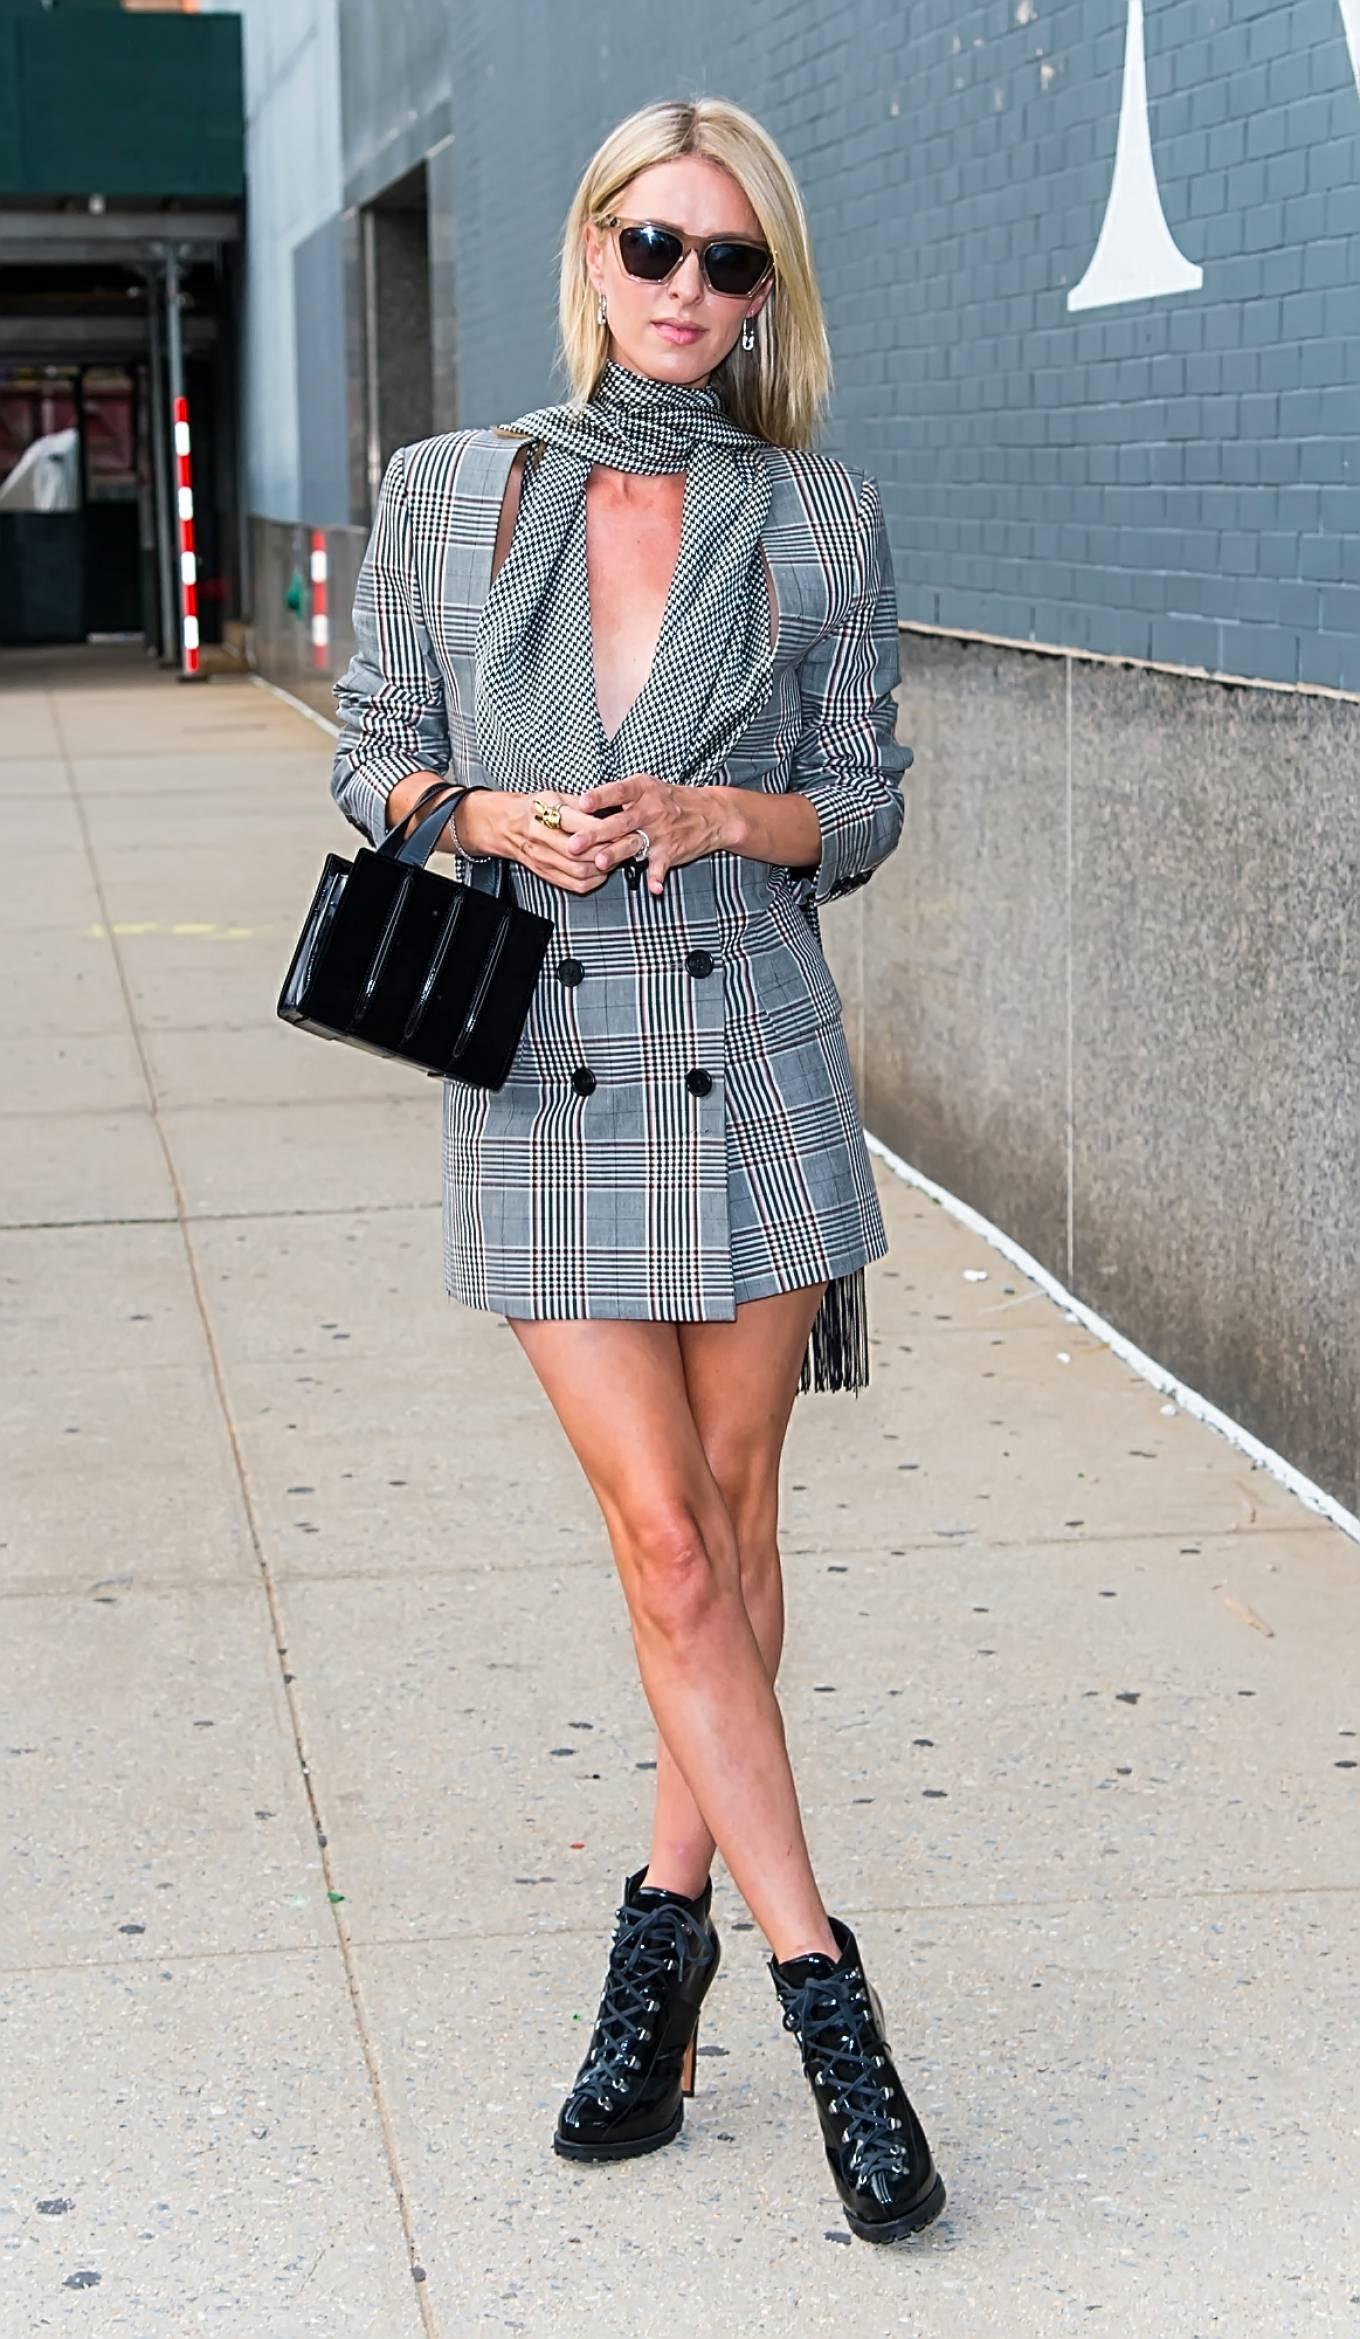 Nicky Hilton 2020 : Nicky Hilton – New York Fashion Week – Monse Fall-Winter 2020 Presentation-38